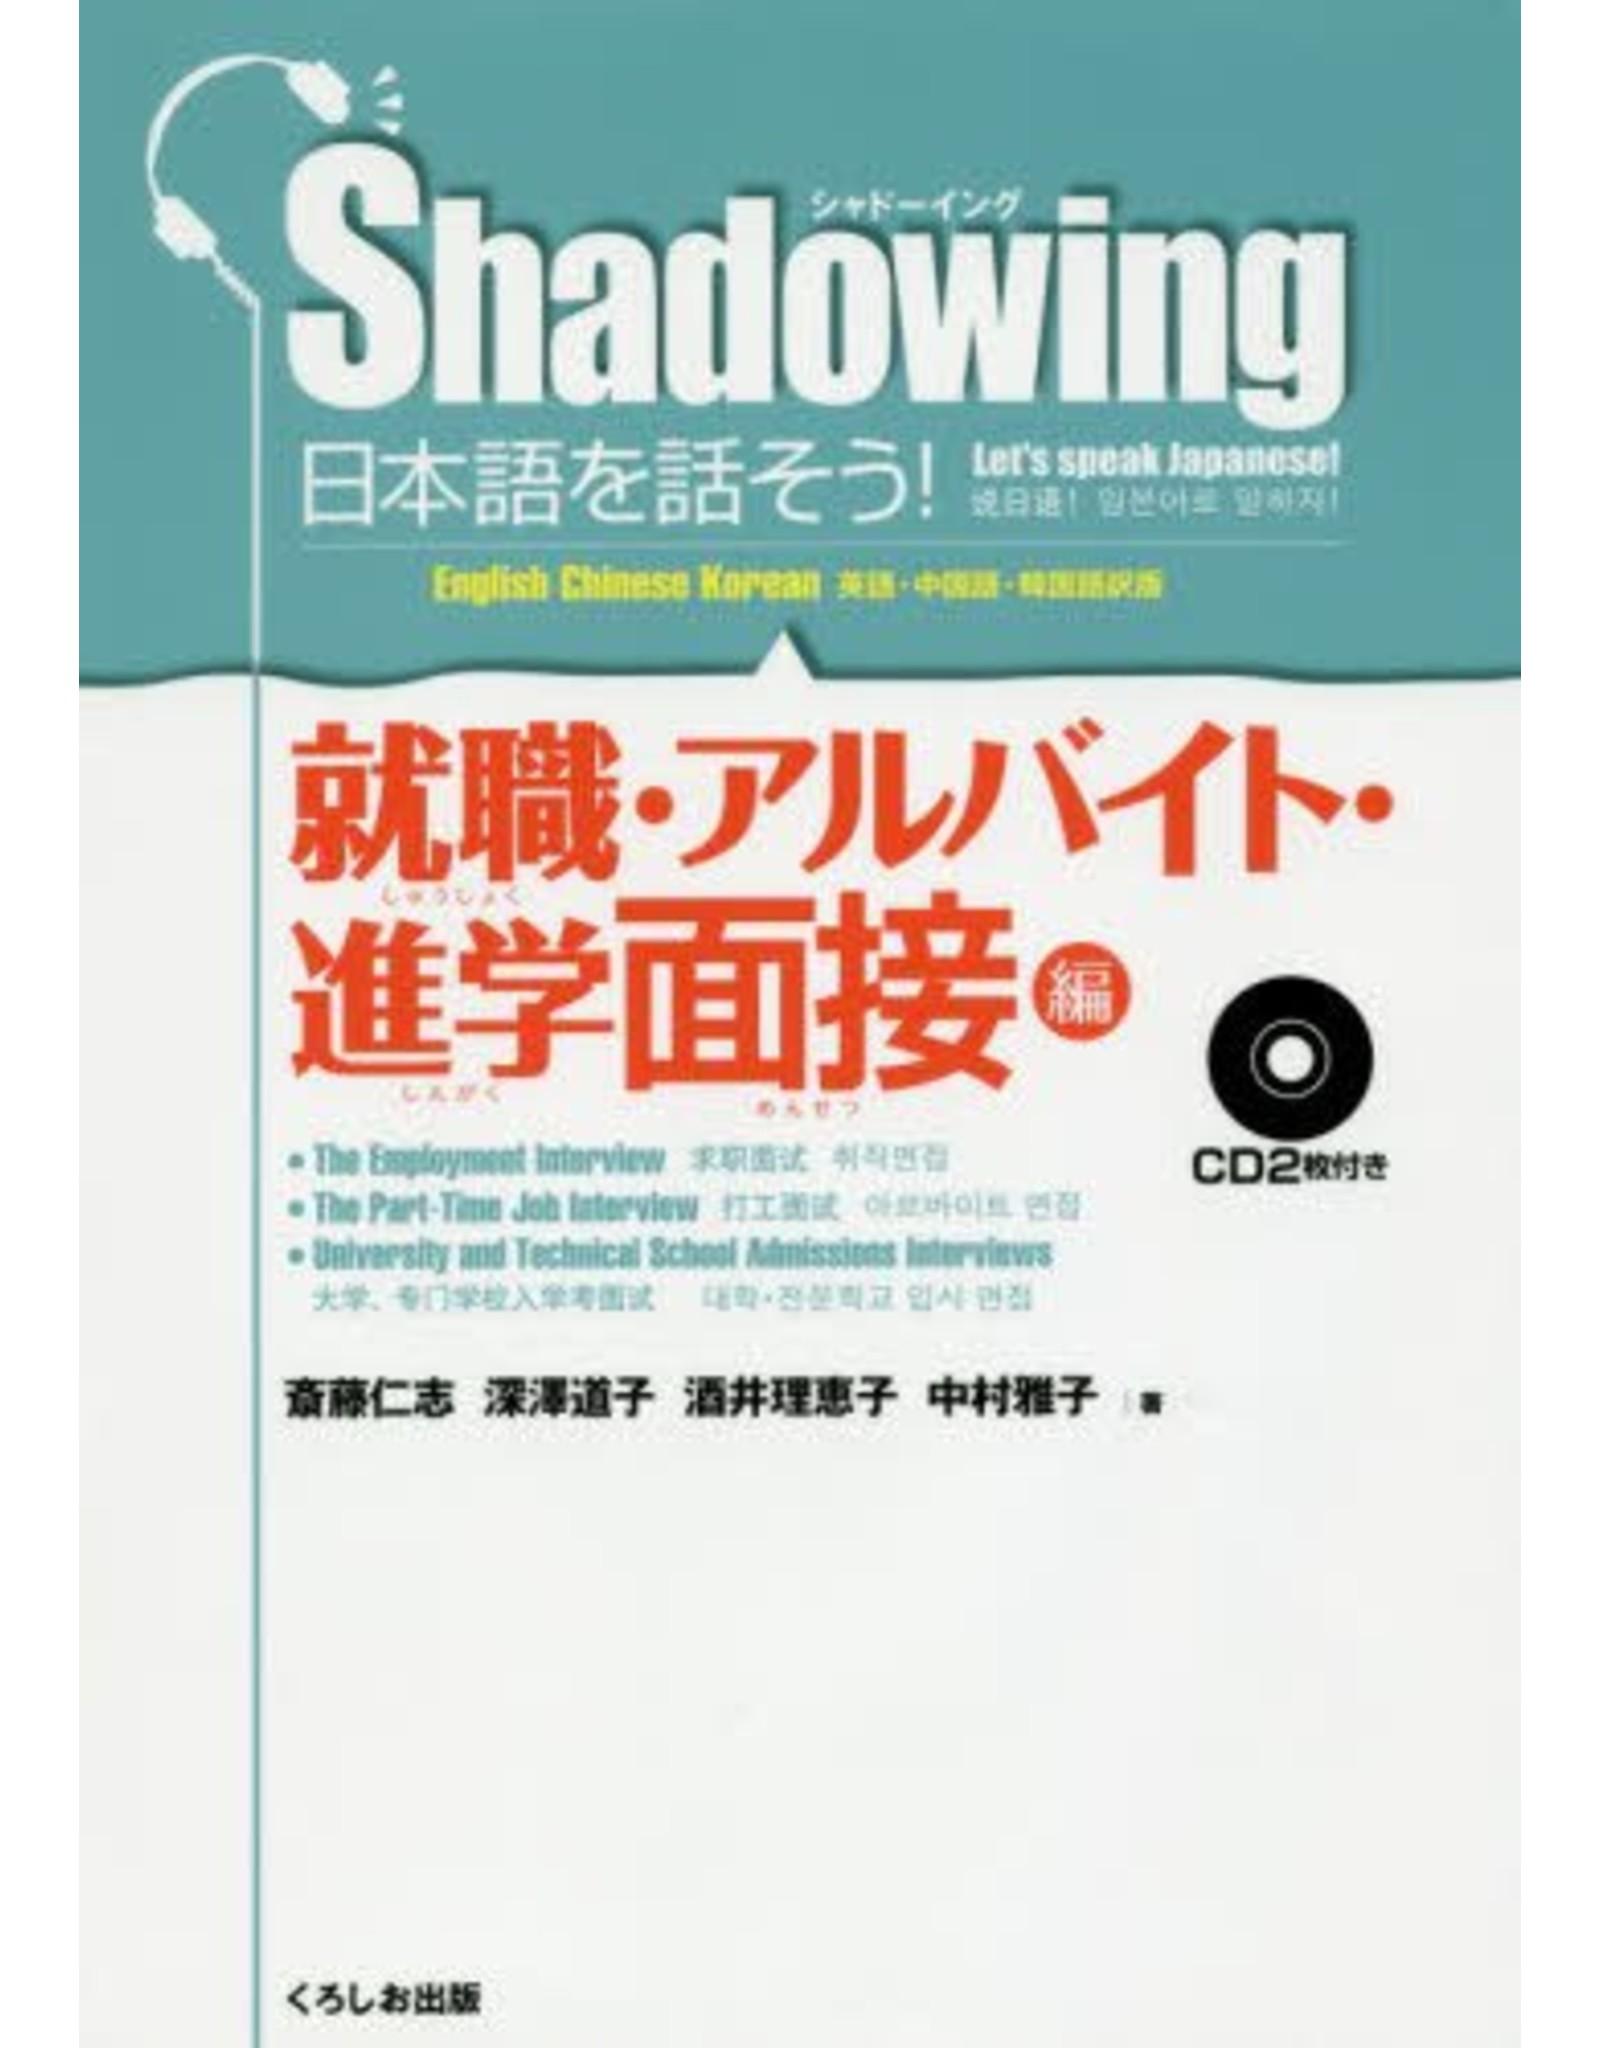 KUROSHIO SHADOWING : EMPLOYMENT, PART-TIME JOB, UNIVERSITY ADMISSIONS INTERVIEWS W/CDS